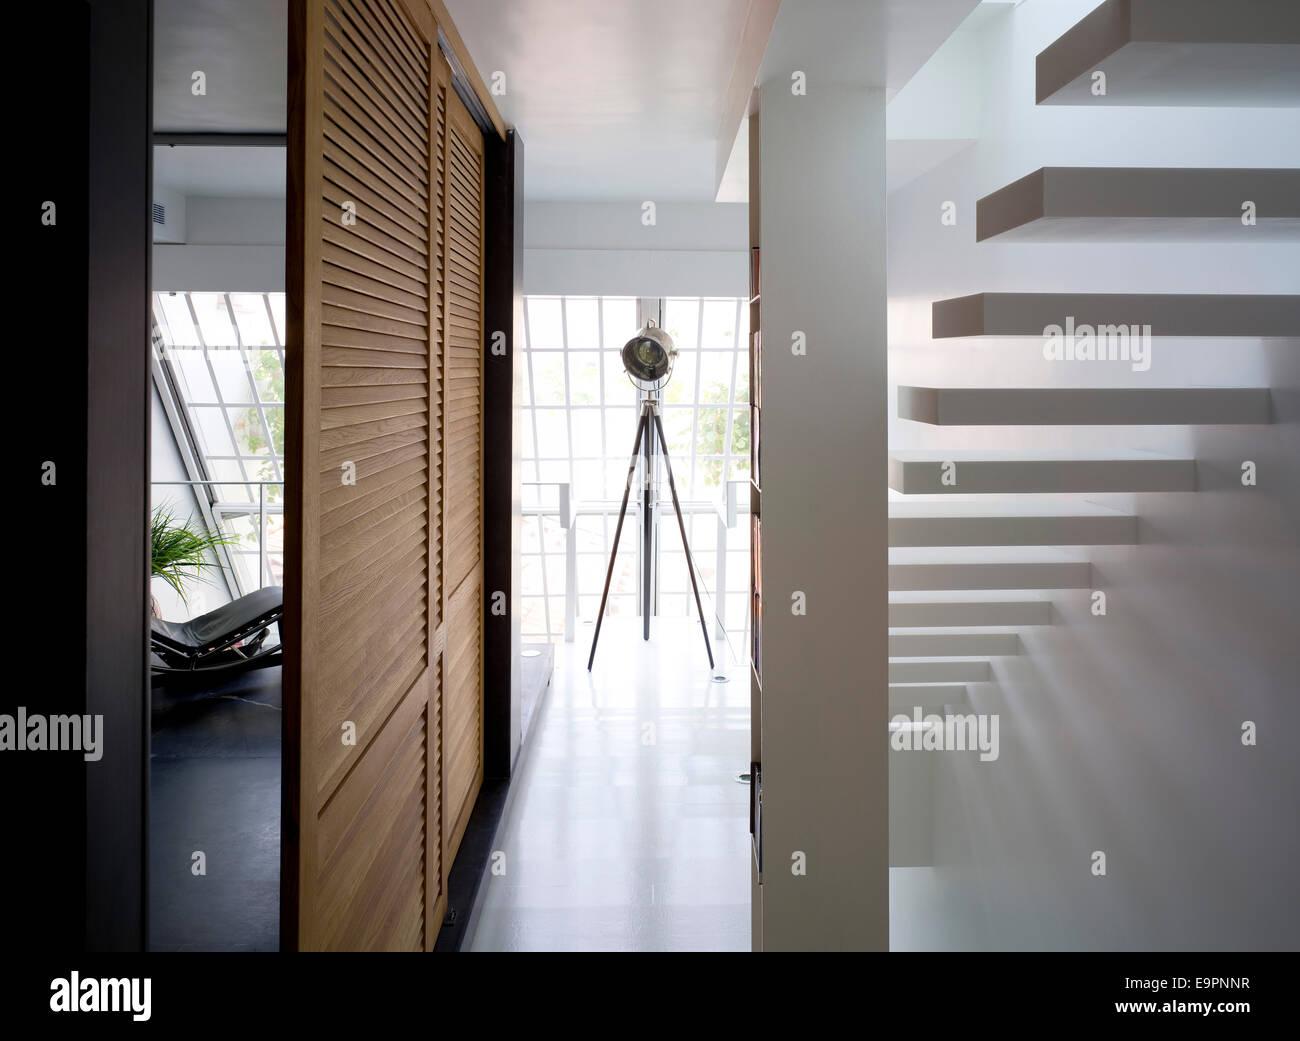 Louvered Stockfotos & Louvered Bilder - Alamy